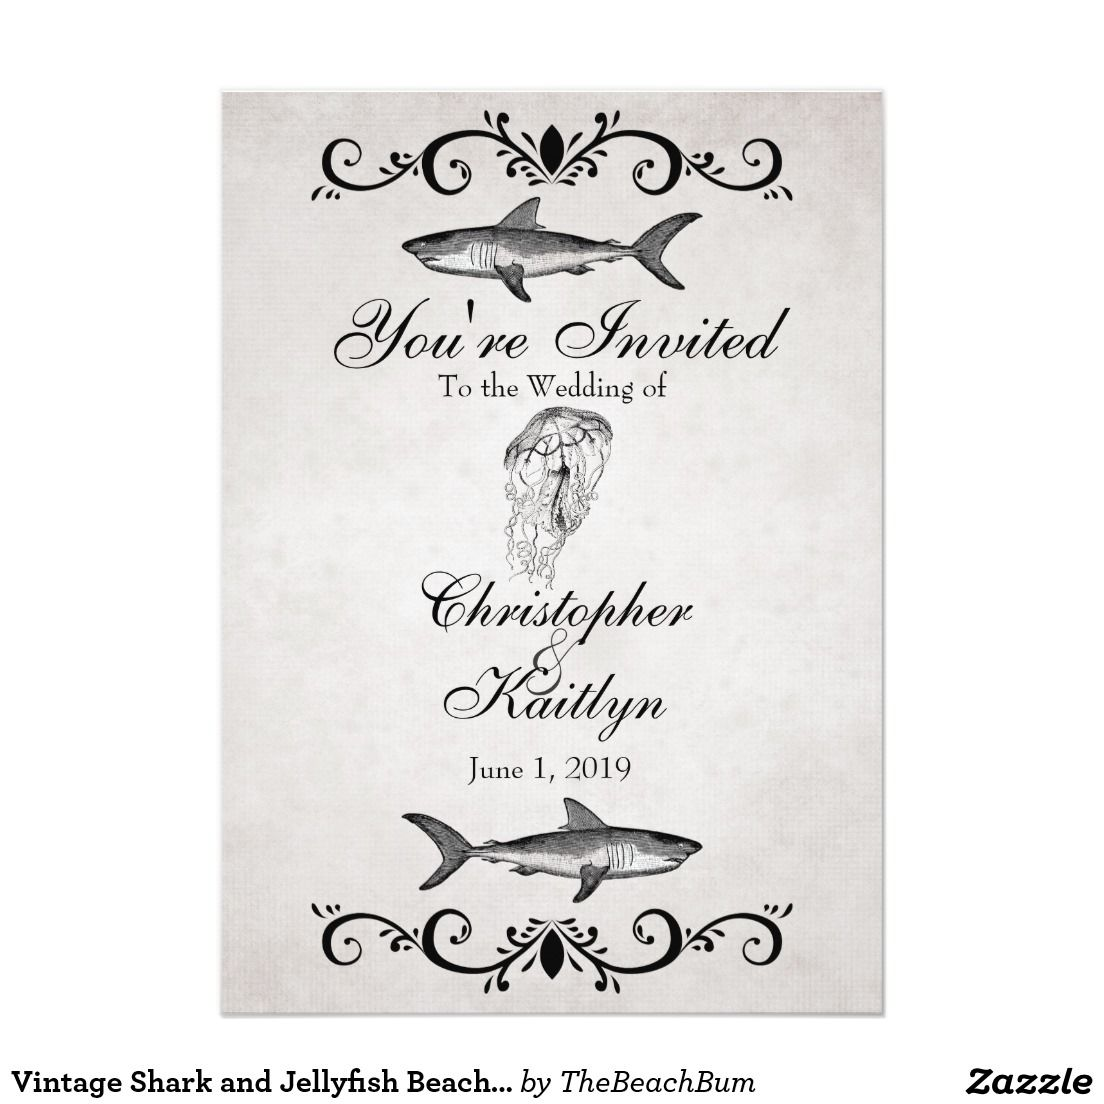 Vintage Shark and Jellyfish Beach Wedding Invite | NAUTICAL WEDDING ...